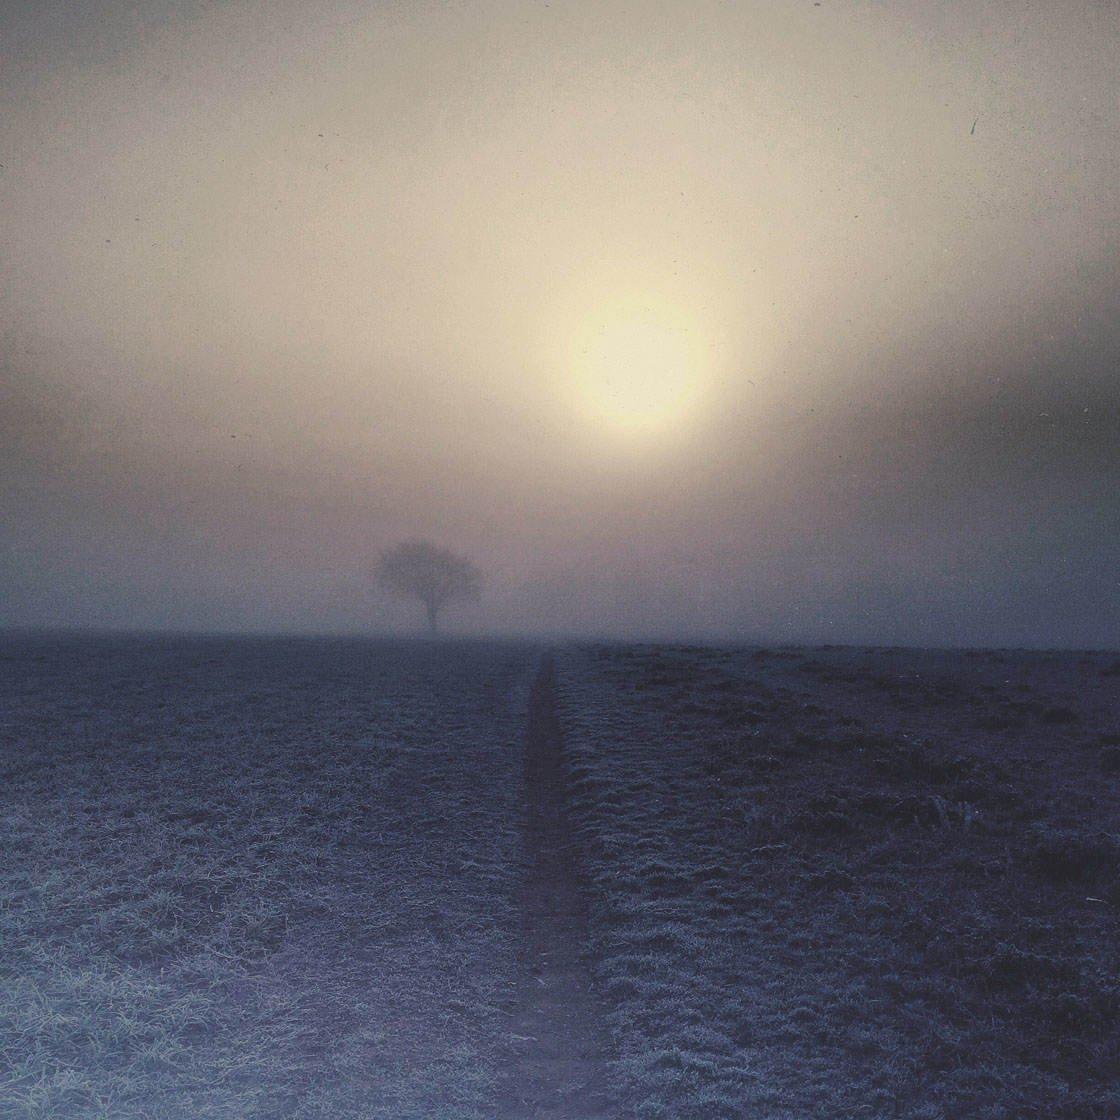 Fog & Mist iPhone Photos 24 no script